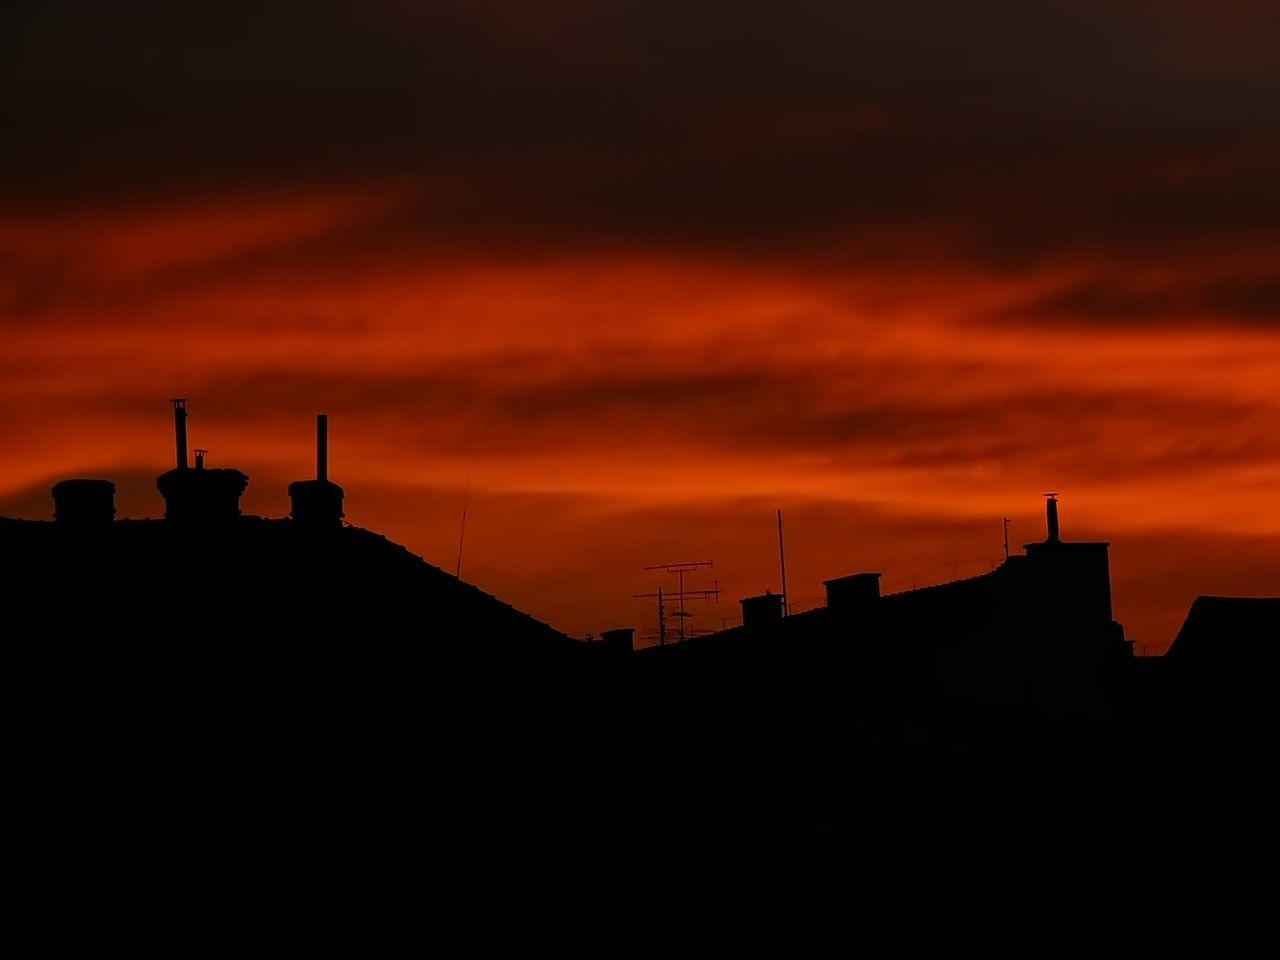 Silhouette Houses Against Orange Sky